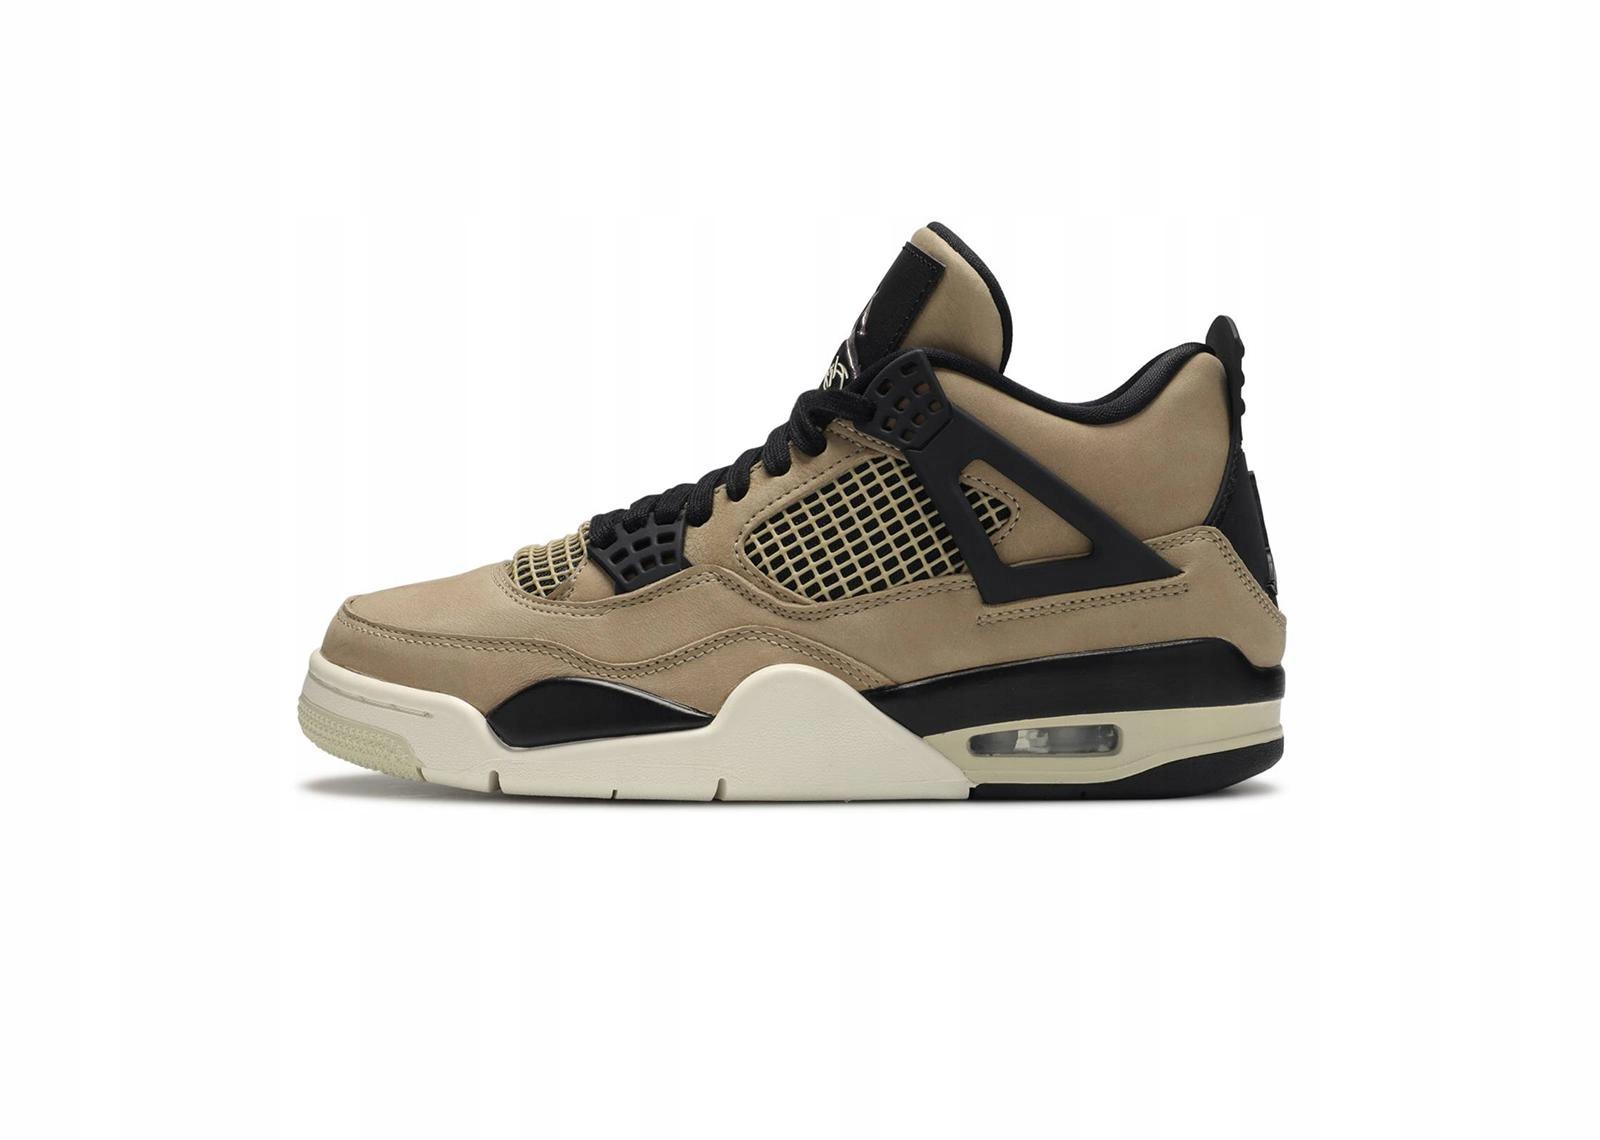 Nike Air Jordan 4 Retro Mushroom 14 Sneakers